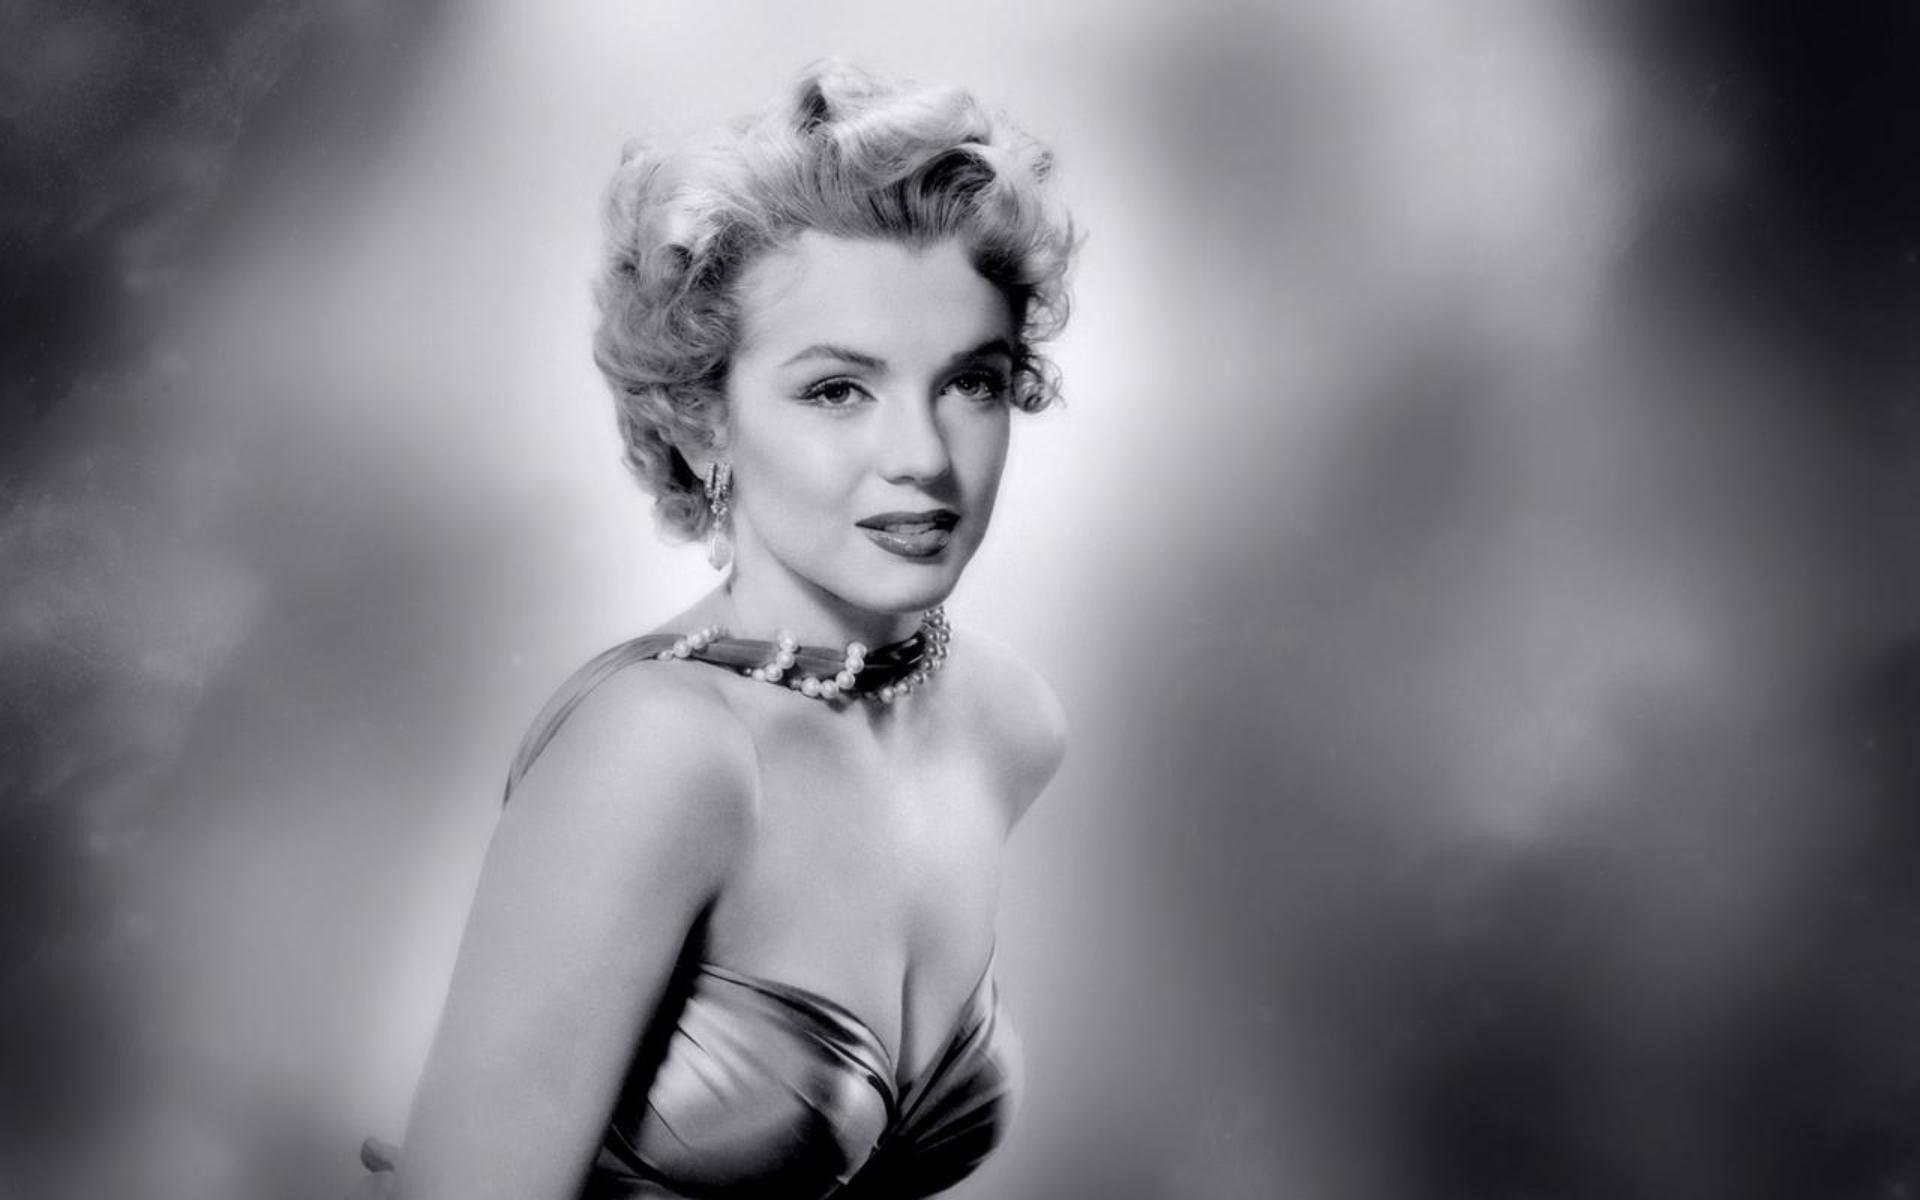 Marilyn Monroe Wallpaper 63 images 1920x1200